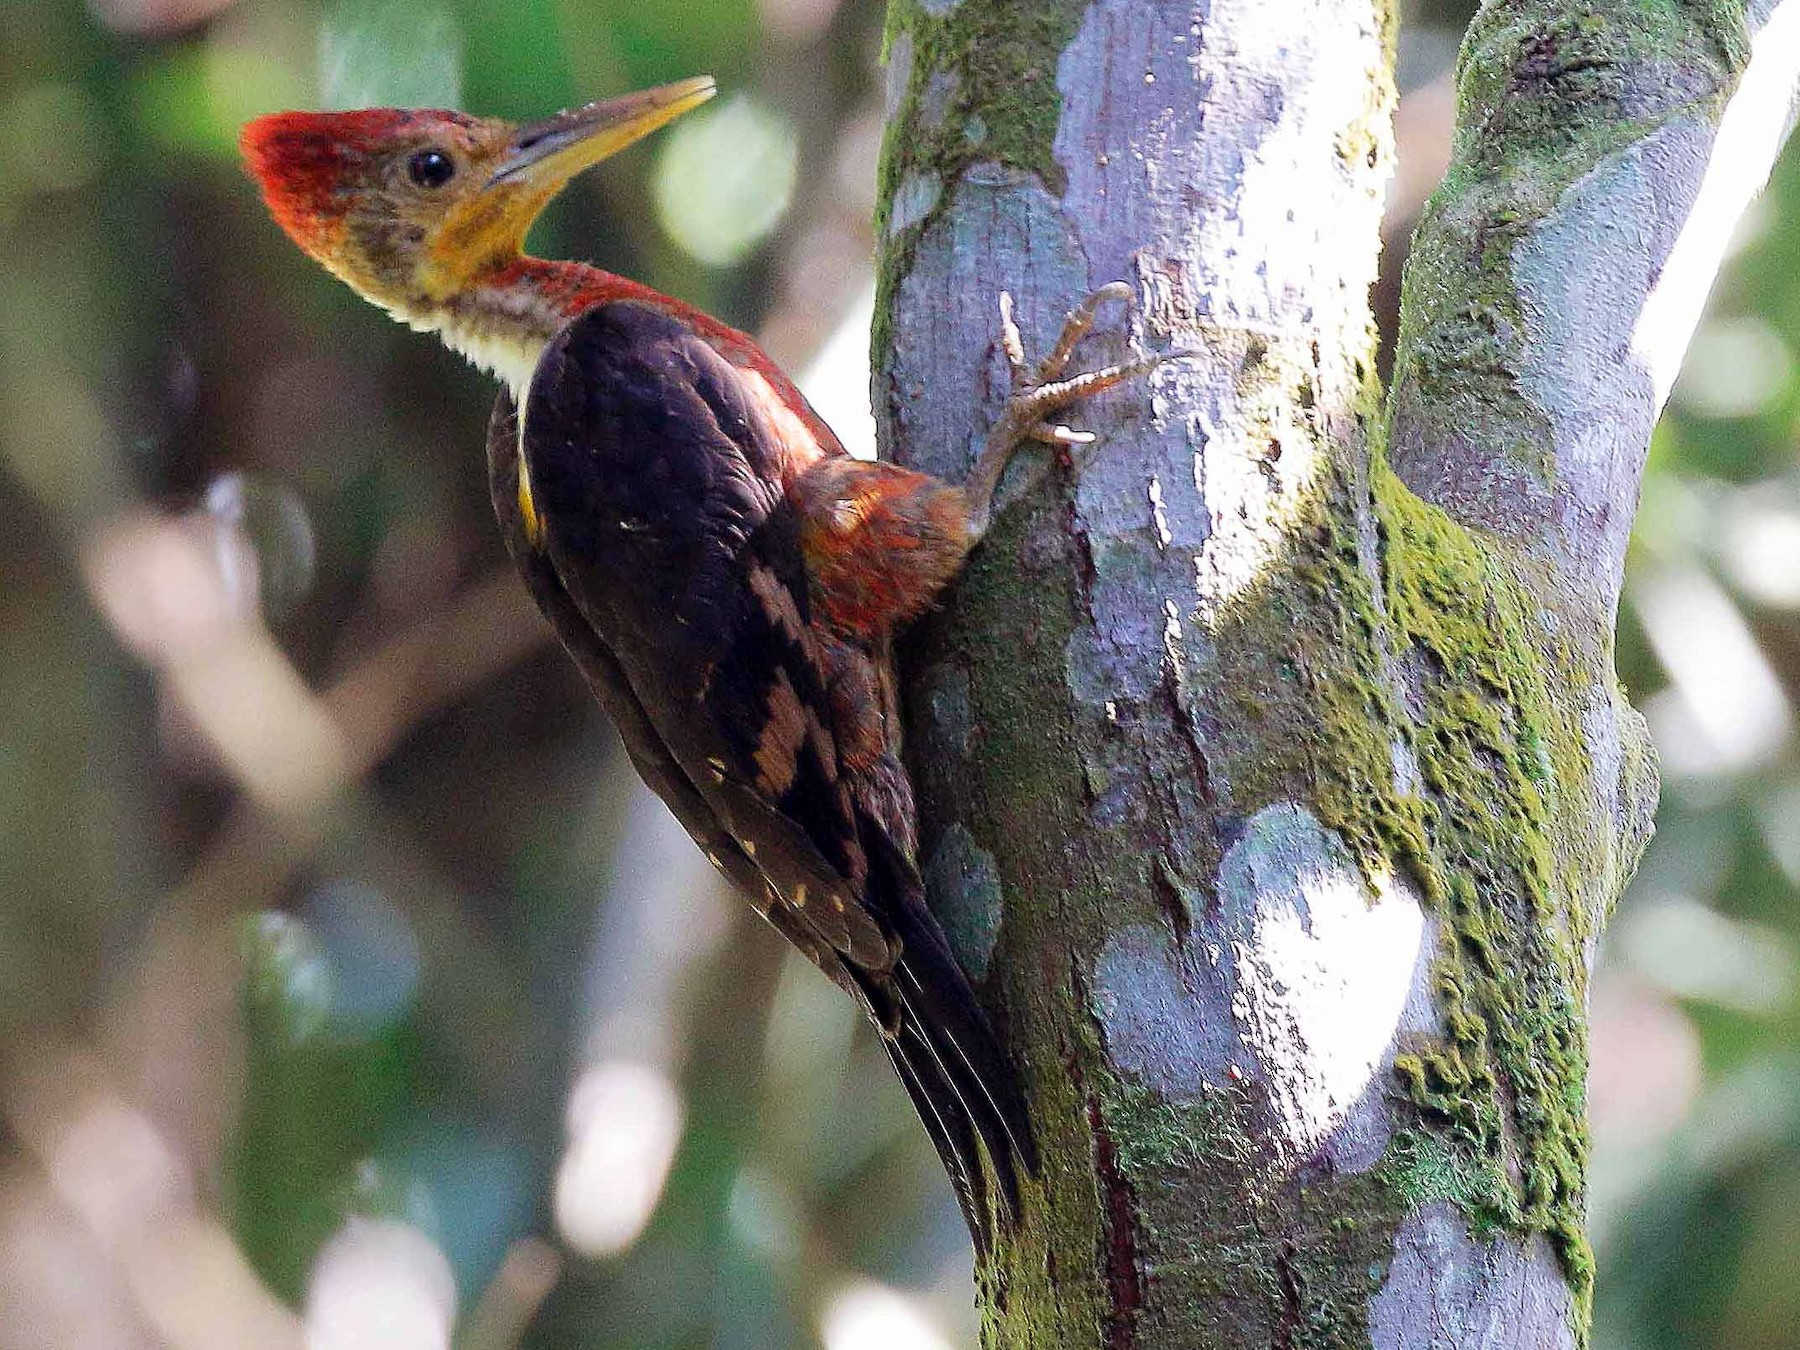 Orange-backed Woodpecker - Neoh Hor Kee